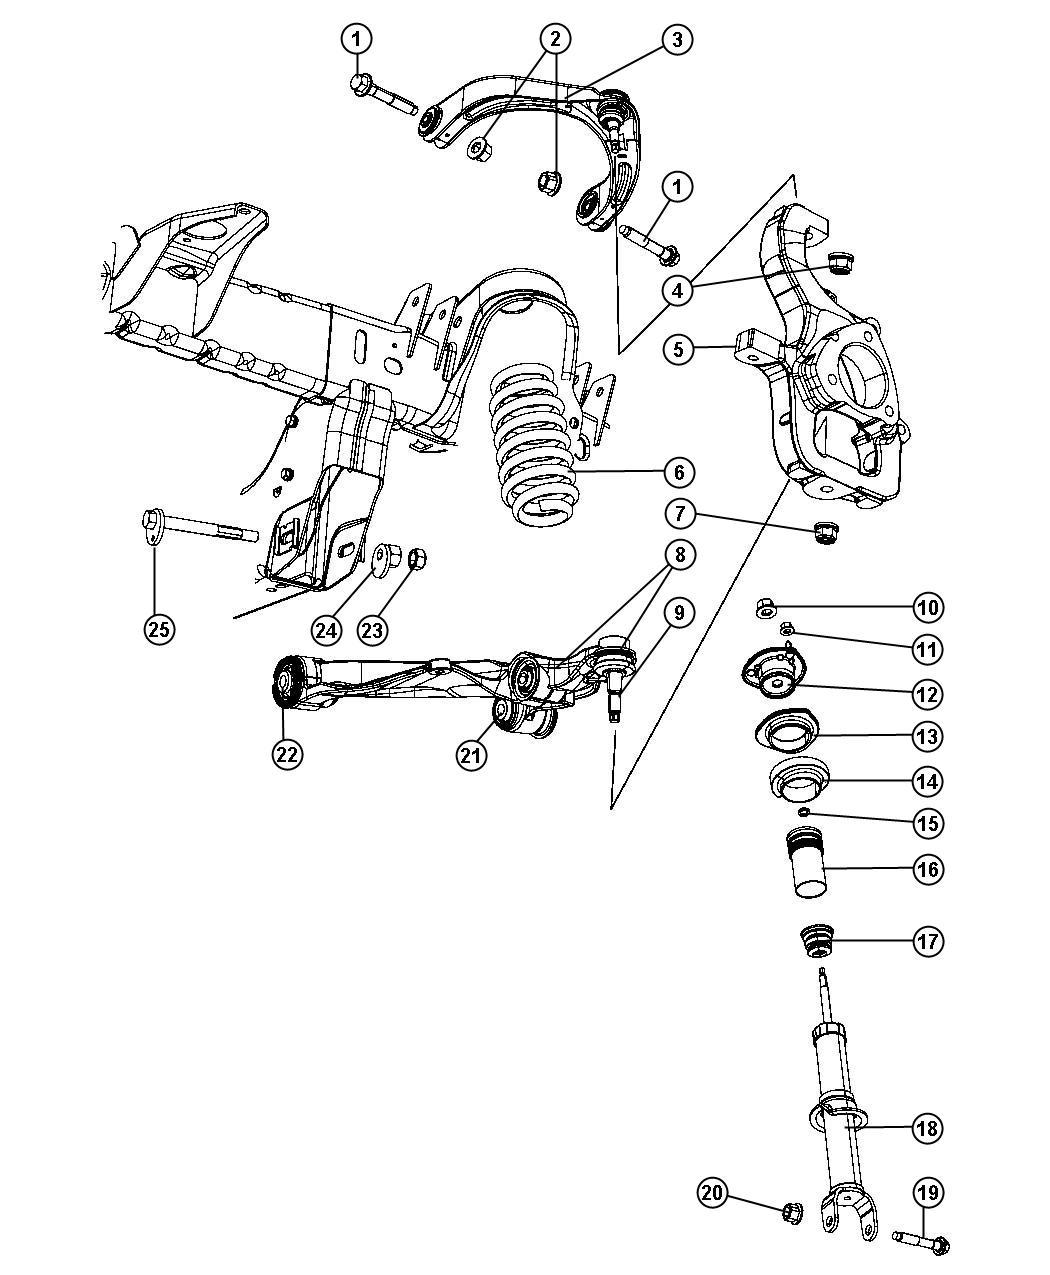 Dodge Dakota Nut. Hex flange lock. M14x2.00. Mounting. Lca